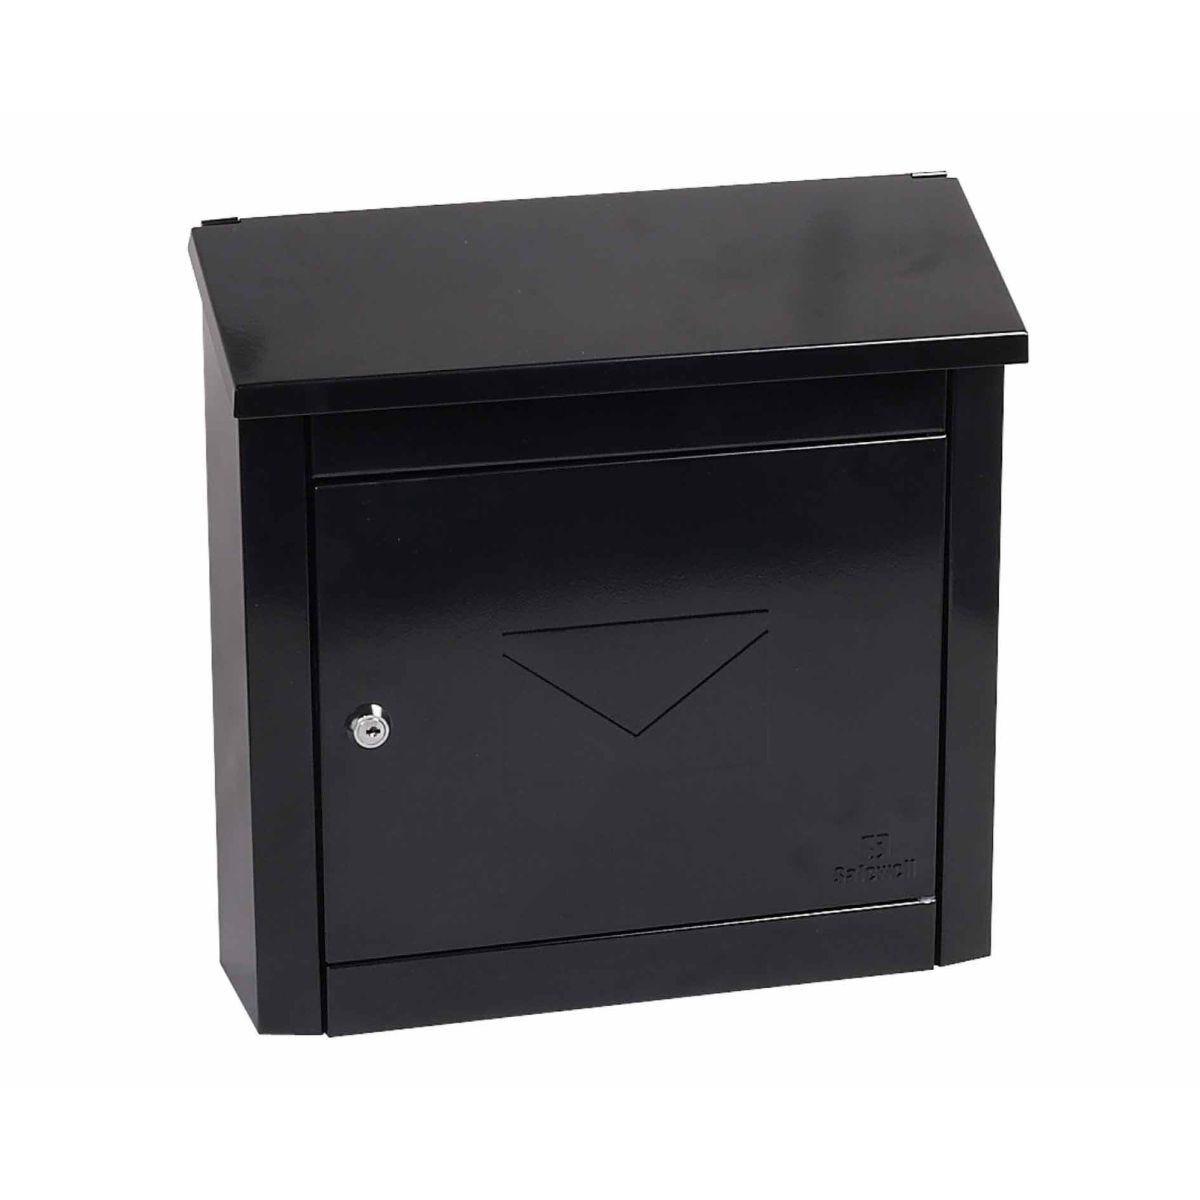 Phoenix Moda MB0113KB Top Loading Mailbox with Key Lock Black